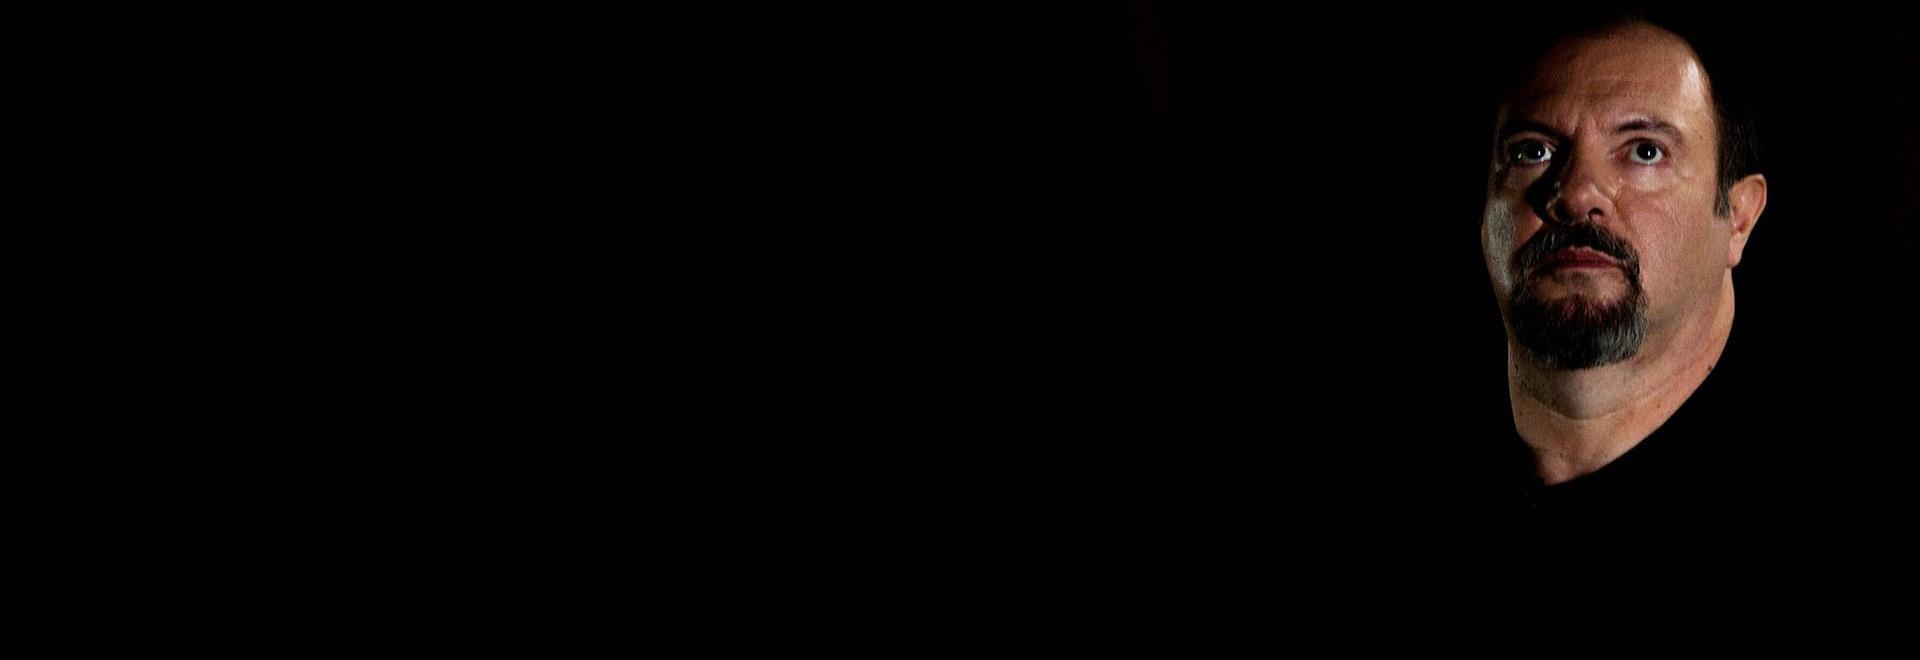 Chet Baker - un Uomo in fuga